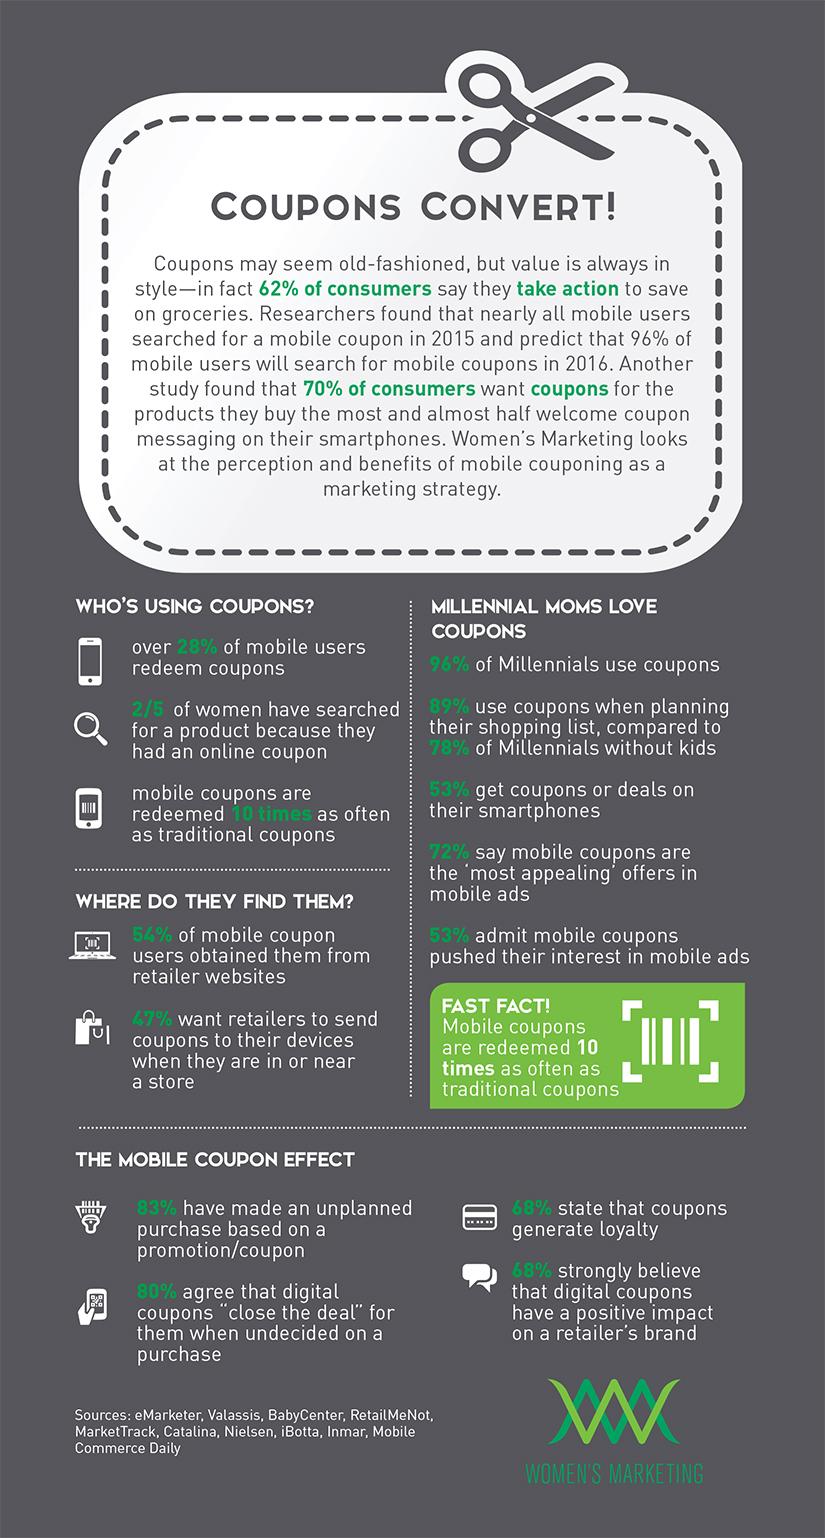 Coupons Convert Infographic WMI